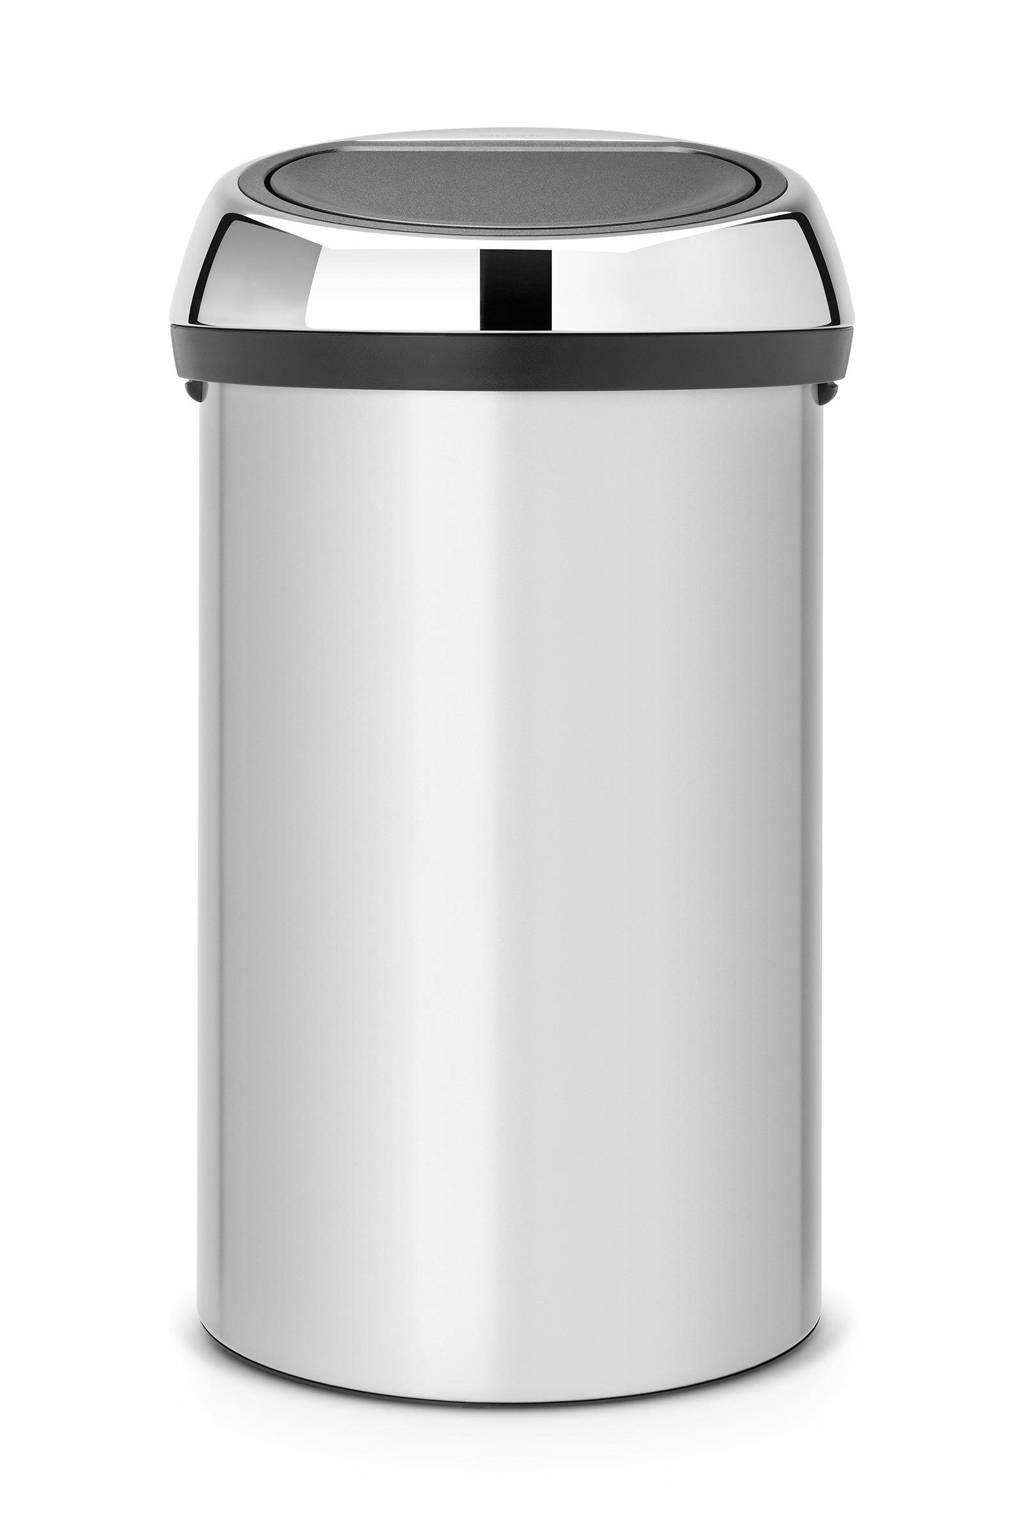 Brabantia Touch Bin 60 liter prullenbak, Metallic Grijs